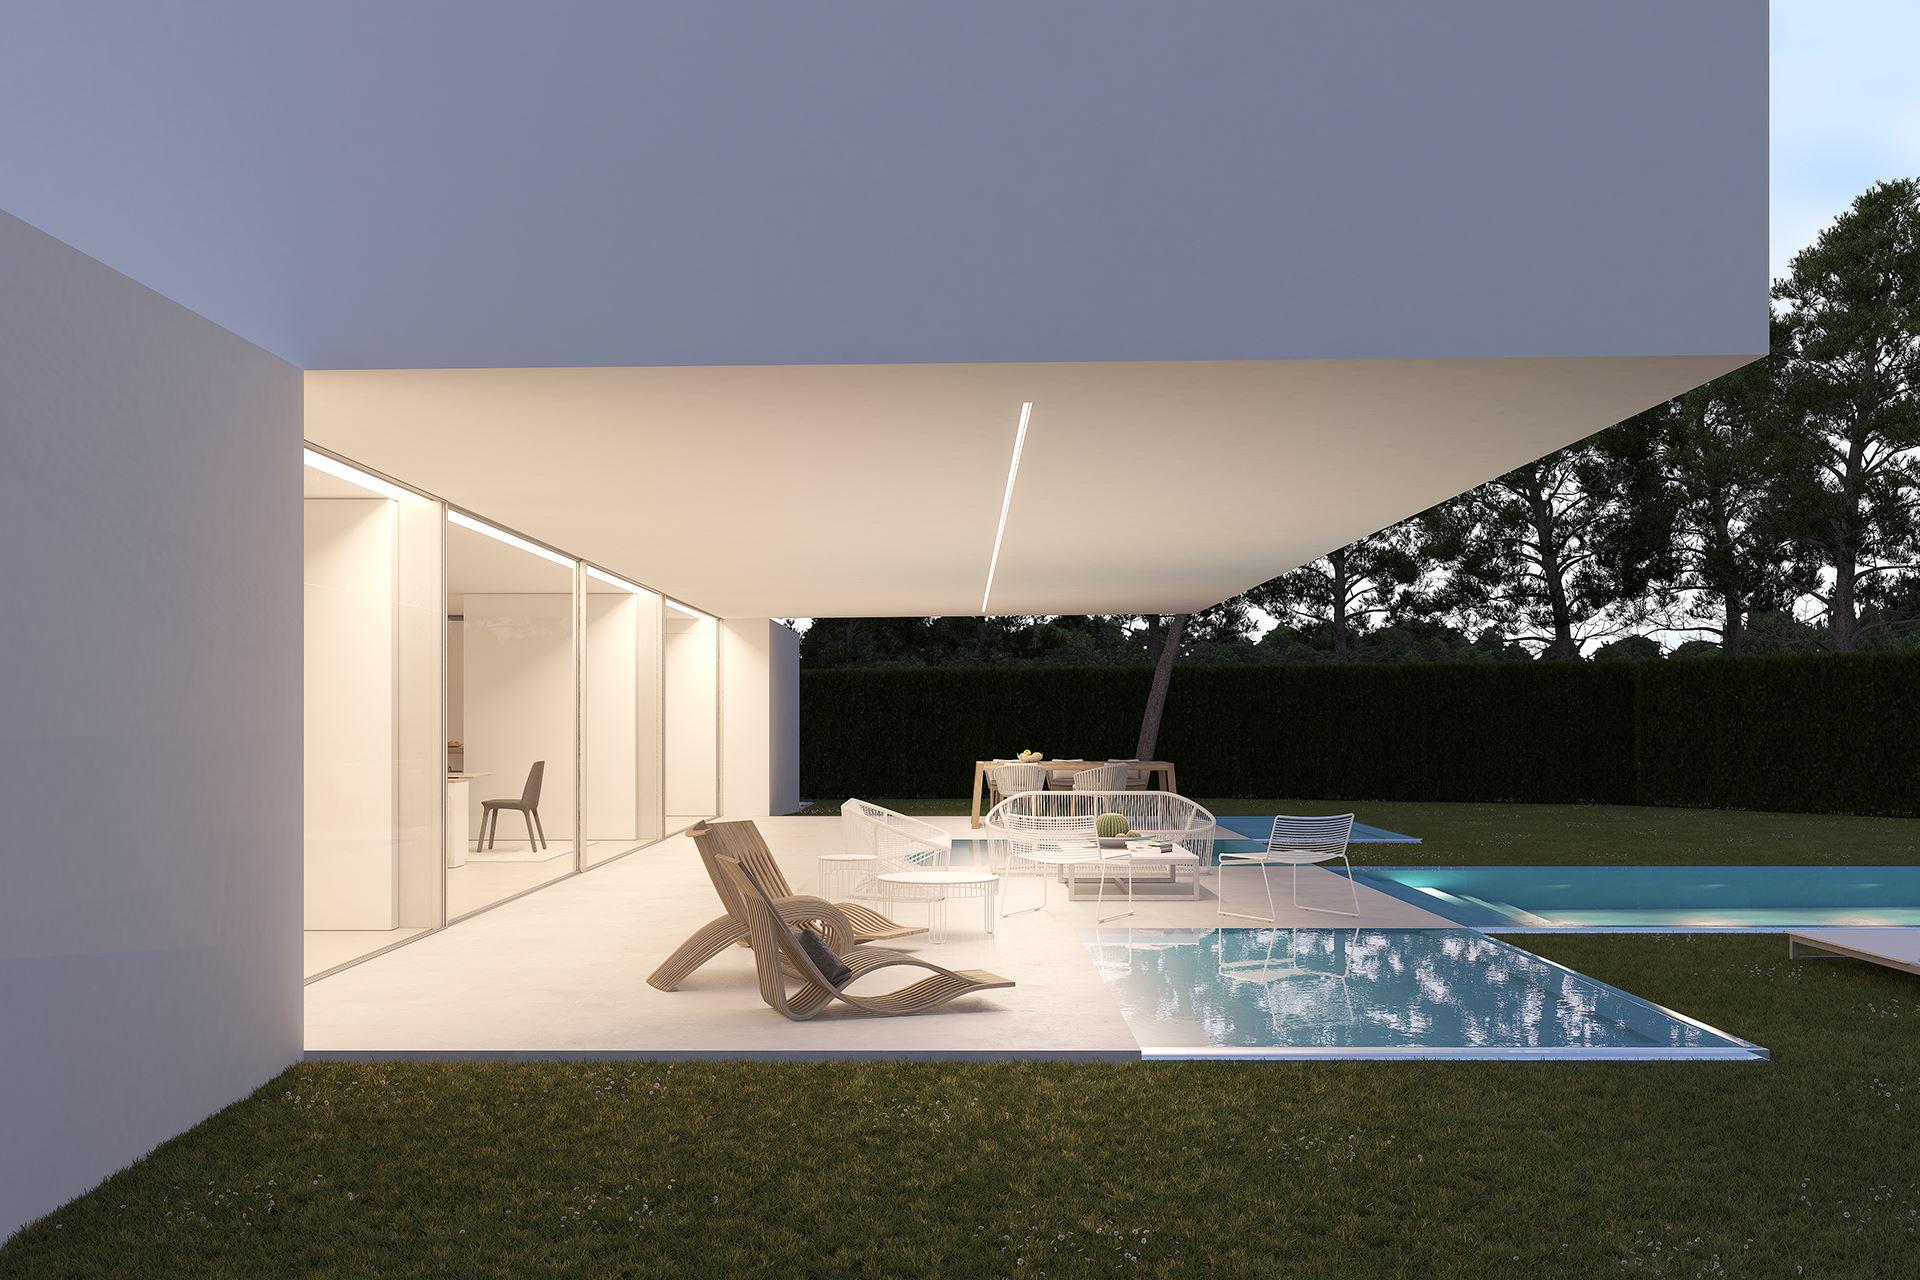 Vivienda en Rocafort Arquitectura